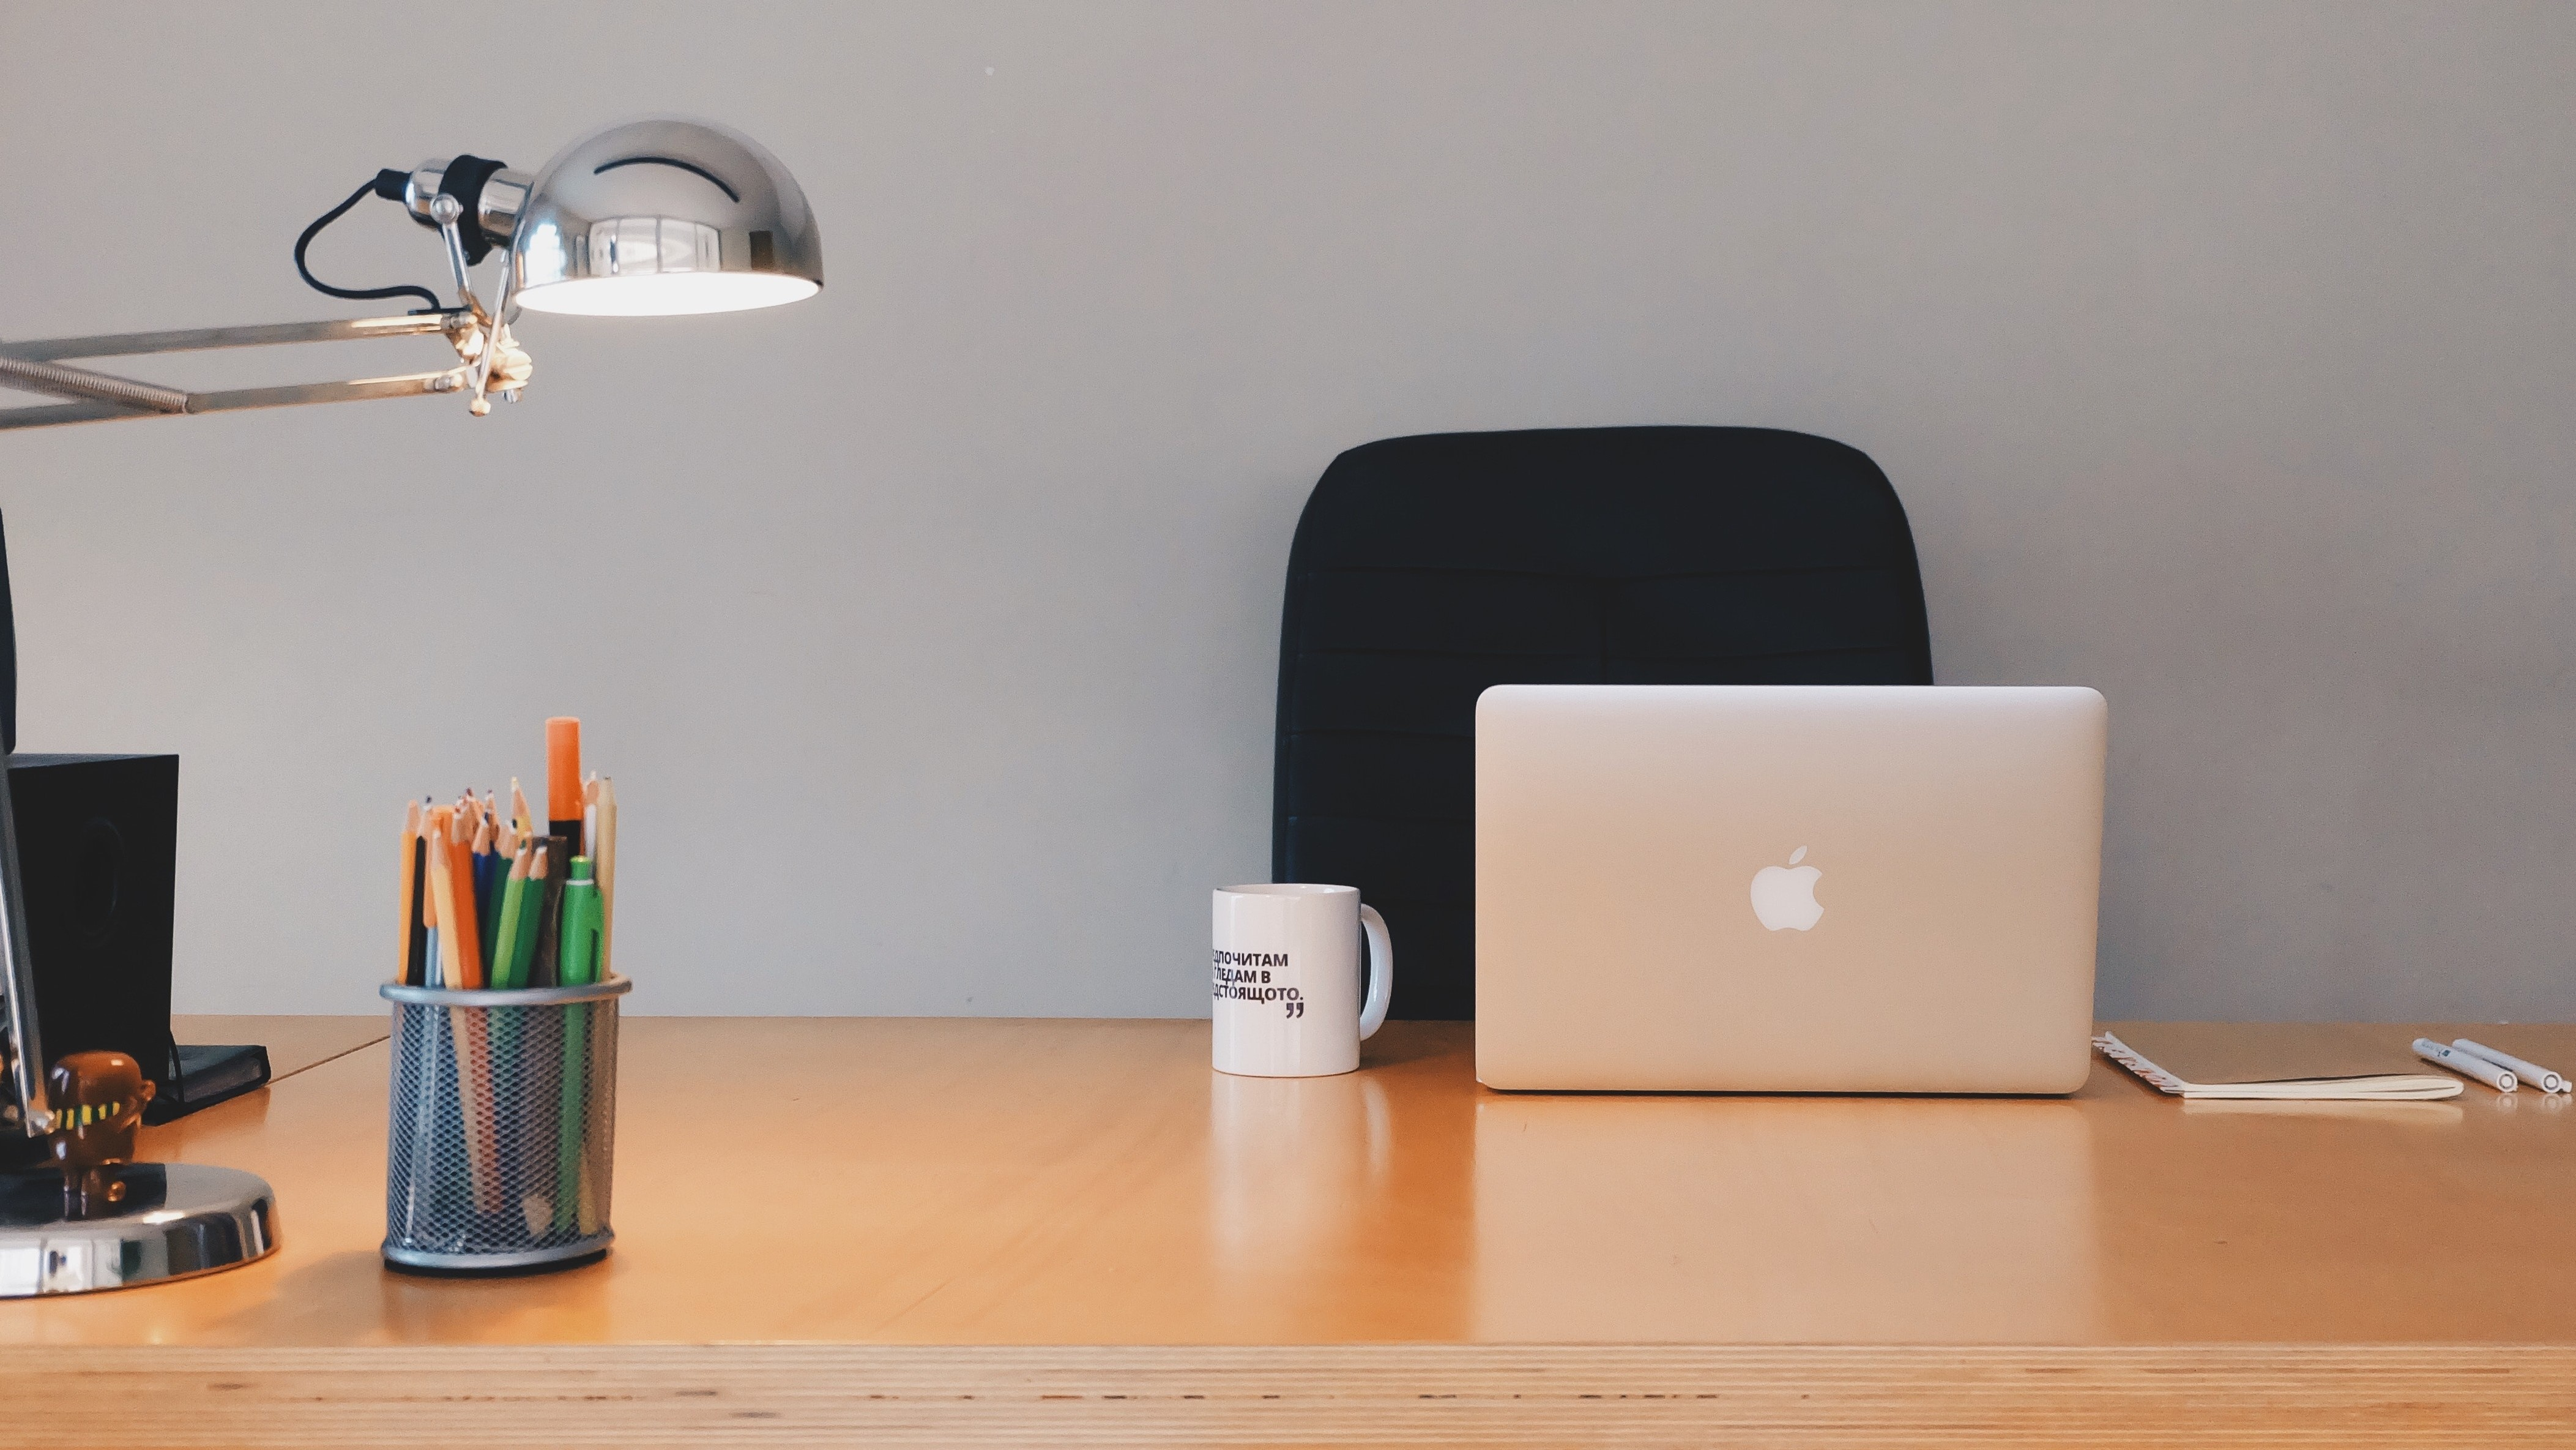 Best Microsoft Office alternatives in 2019